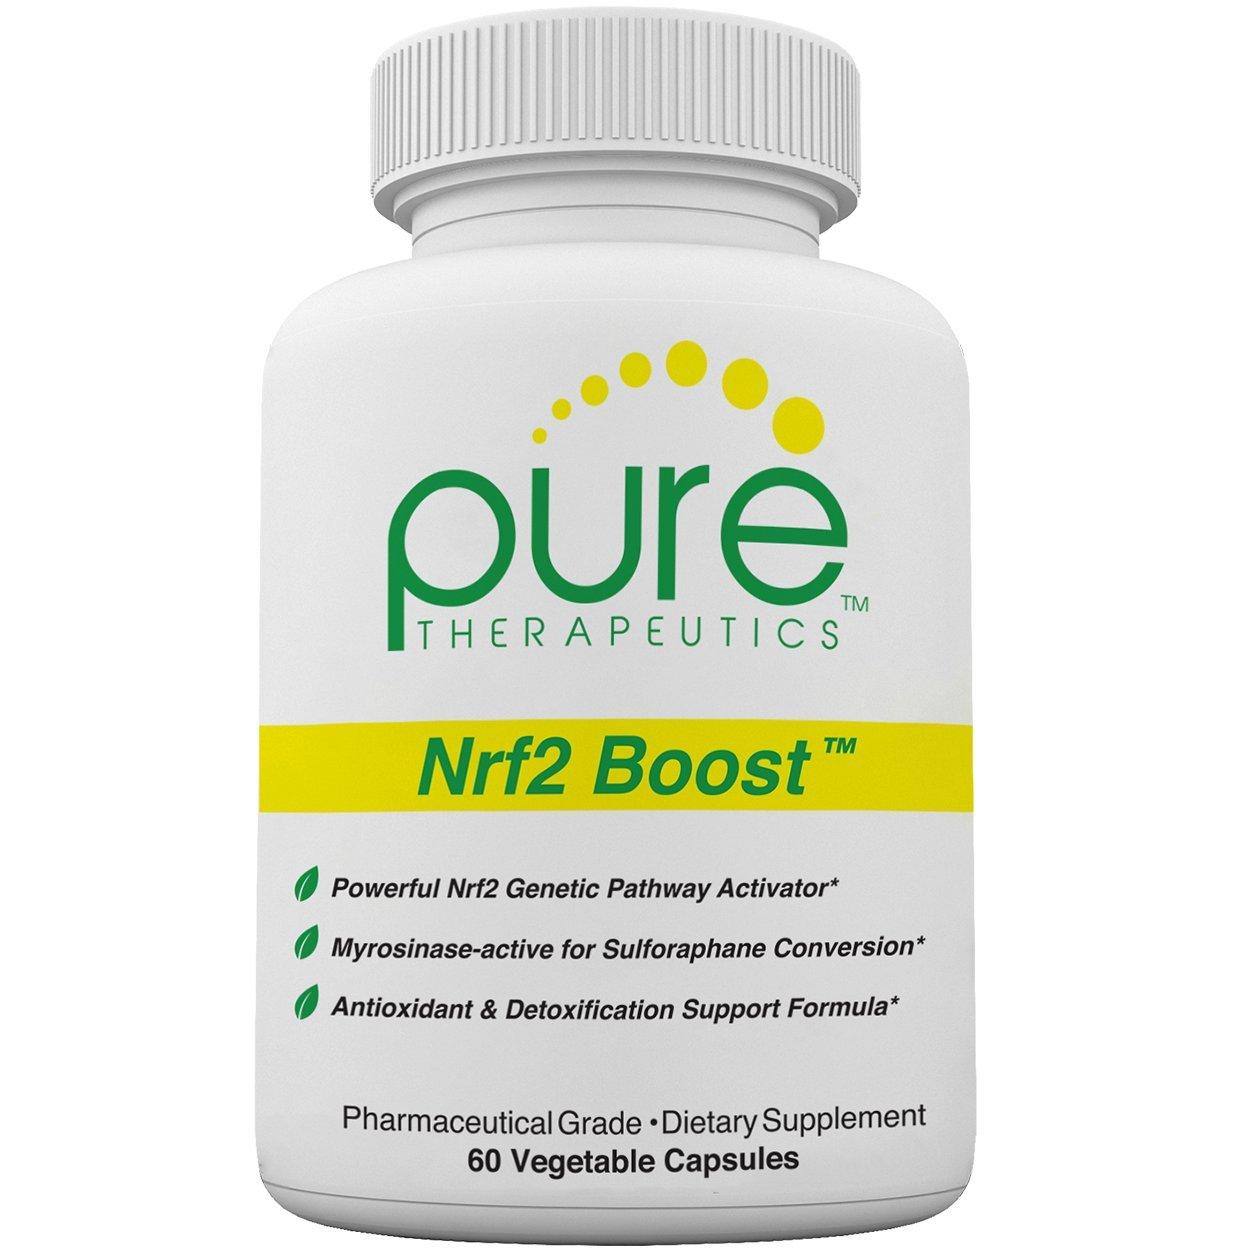 Nrf2 Boost - 60 Veggie Capsules   Oxidative Stress Formula   NRF-2 Activator with Sulforaphane   Contains: truebroc, Curcumin, Green Tea (EGCG), trans-Pterostilbene (pTeroPure), Myrosinase & BioPerine